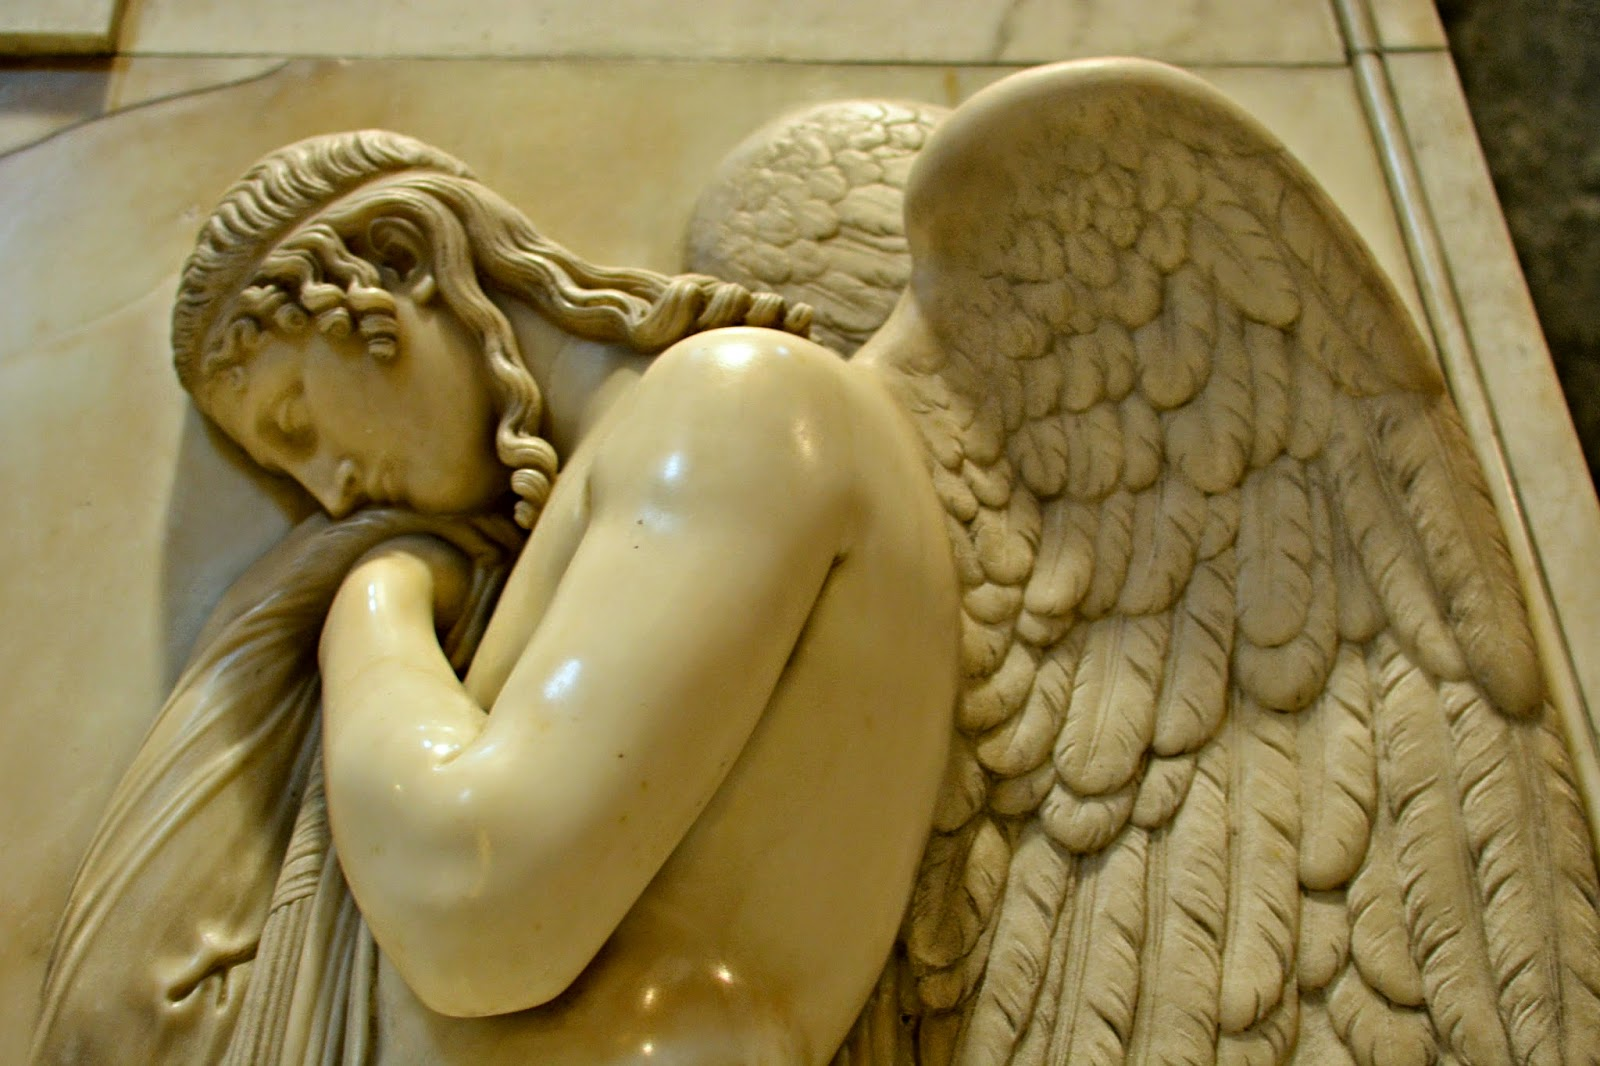 angel sculpture st peter's basilica vatican city